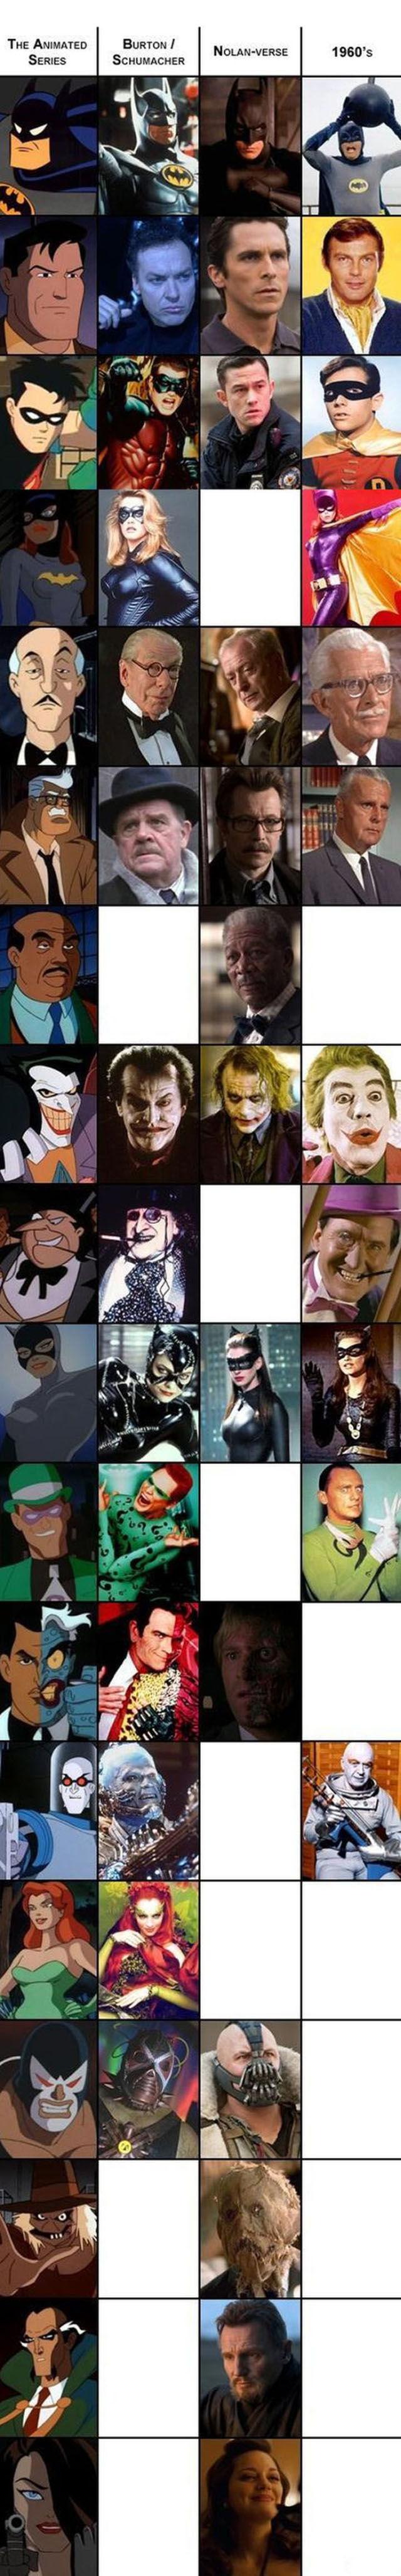 The Many Faces of Batman: A Comparison Chart